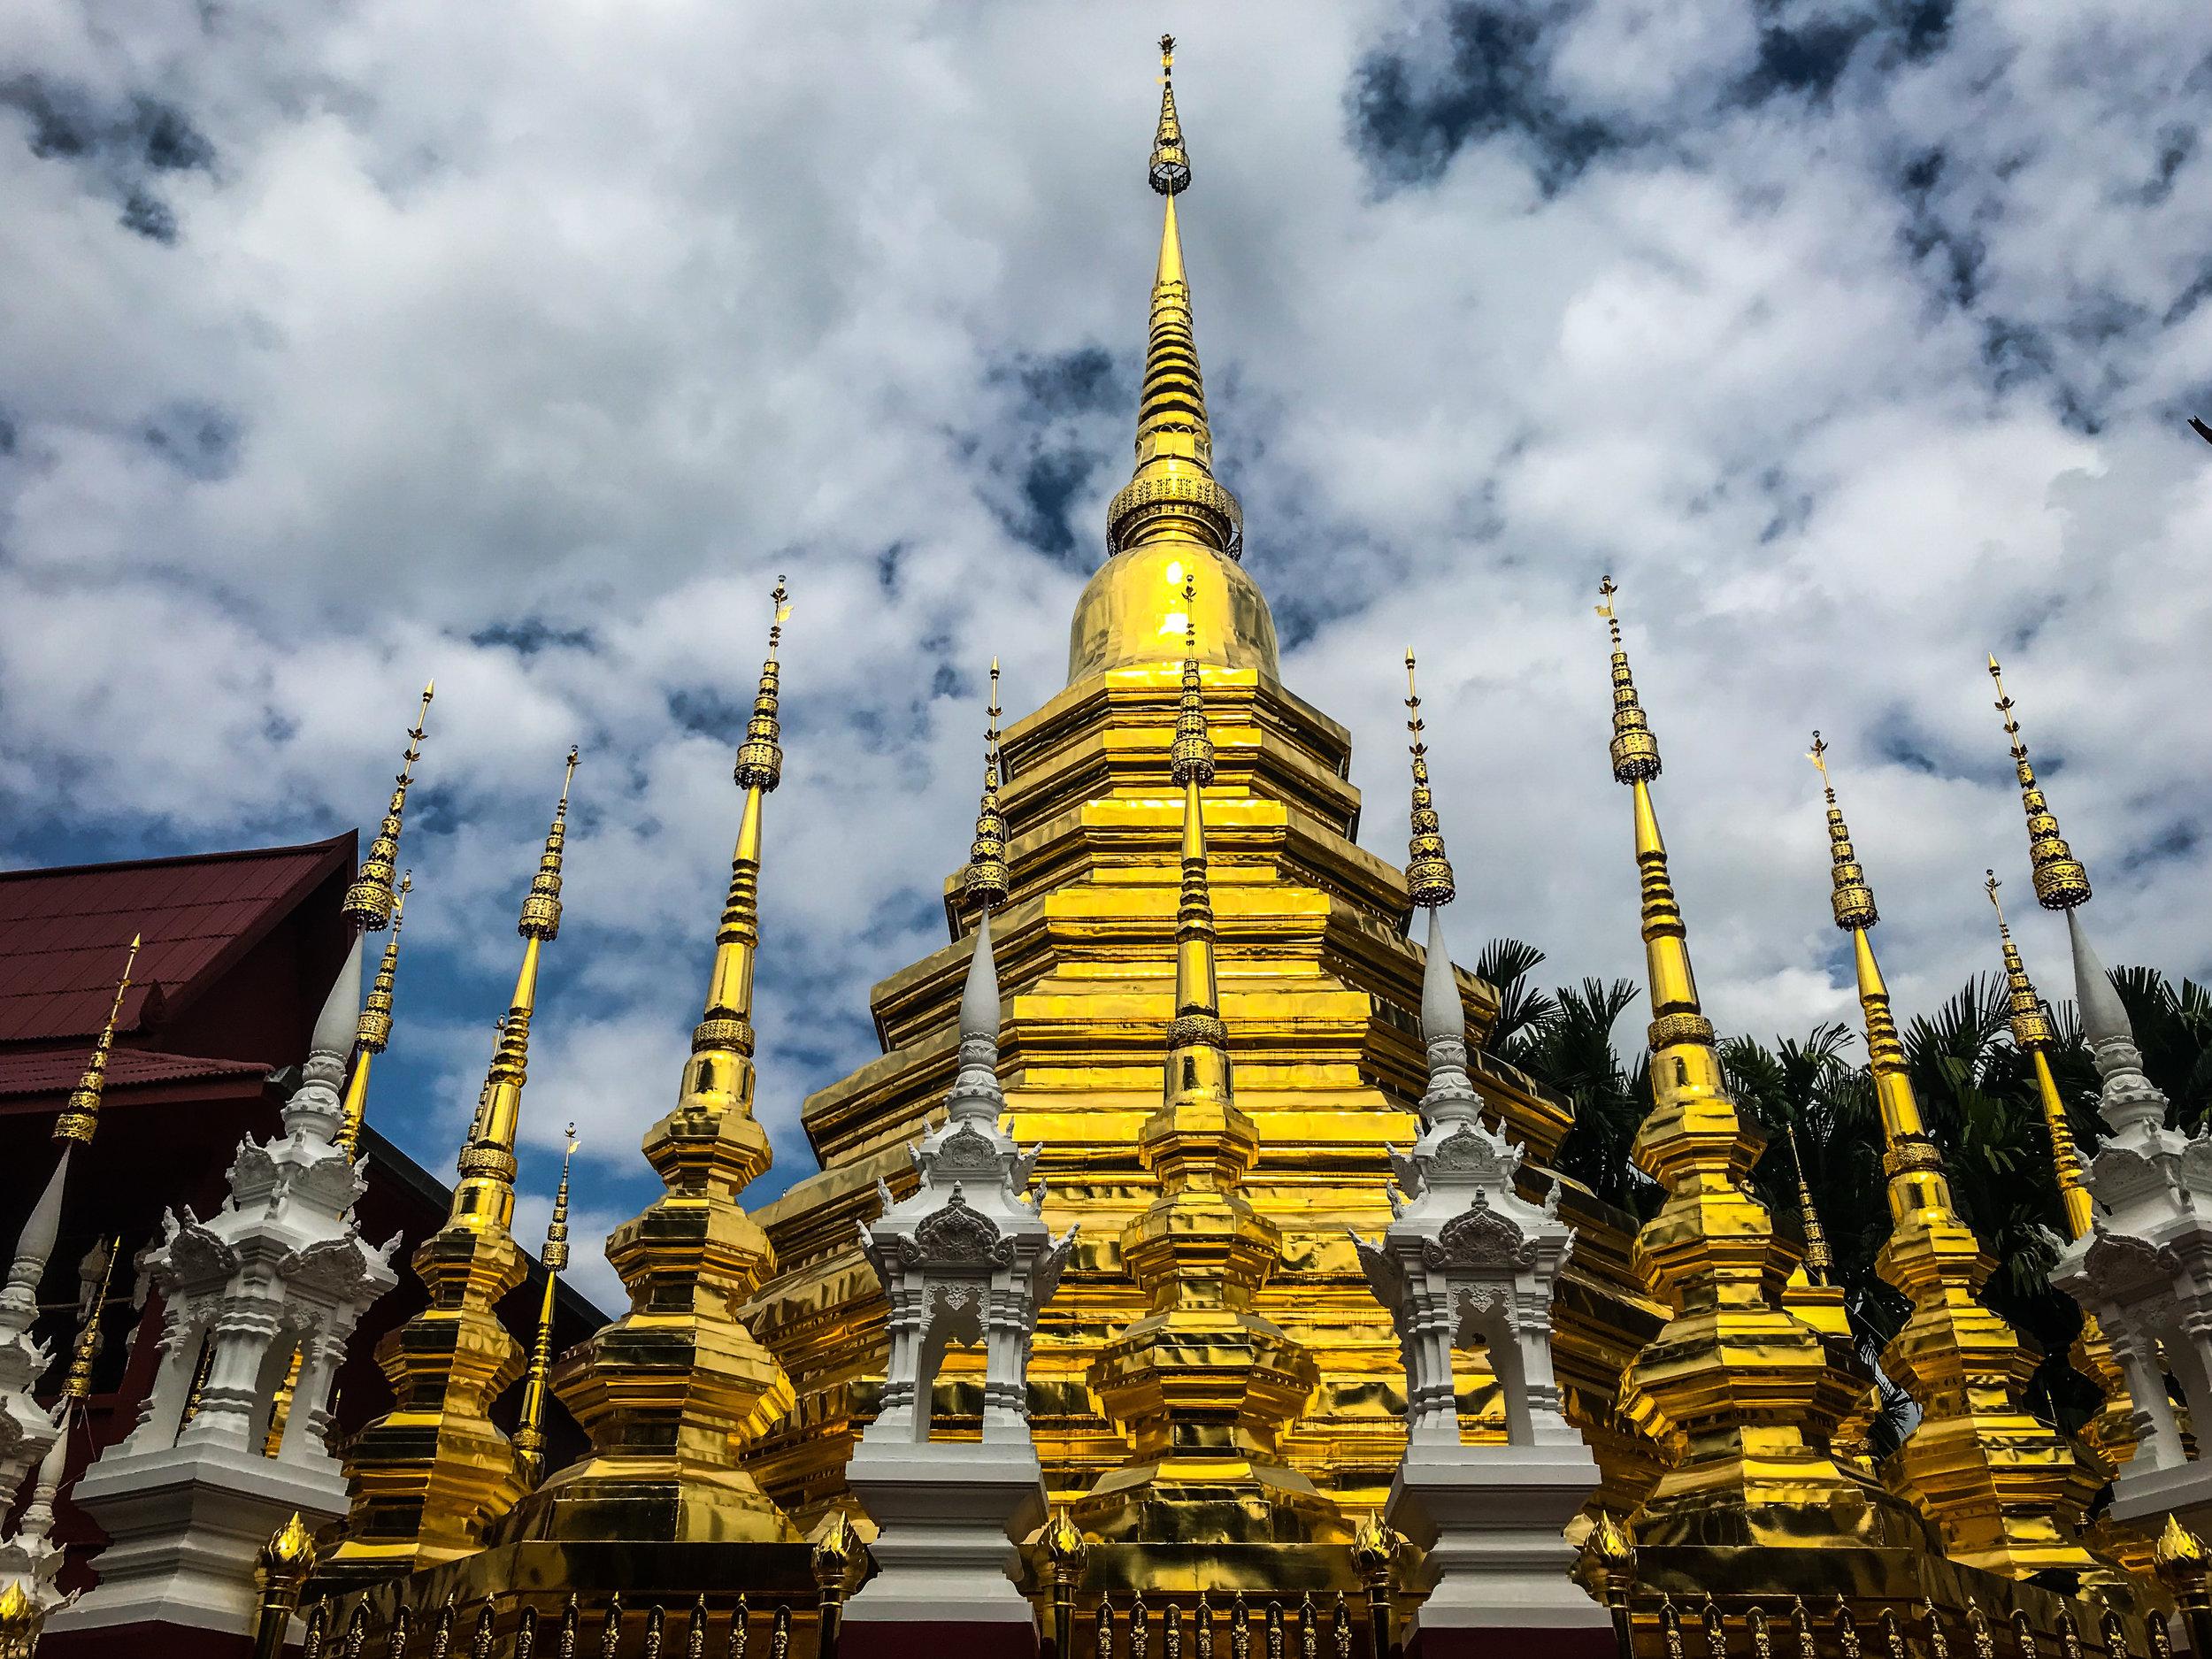 Pagoda - Chiang Mai